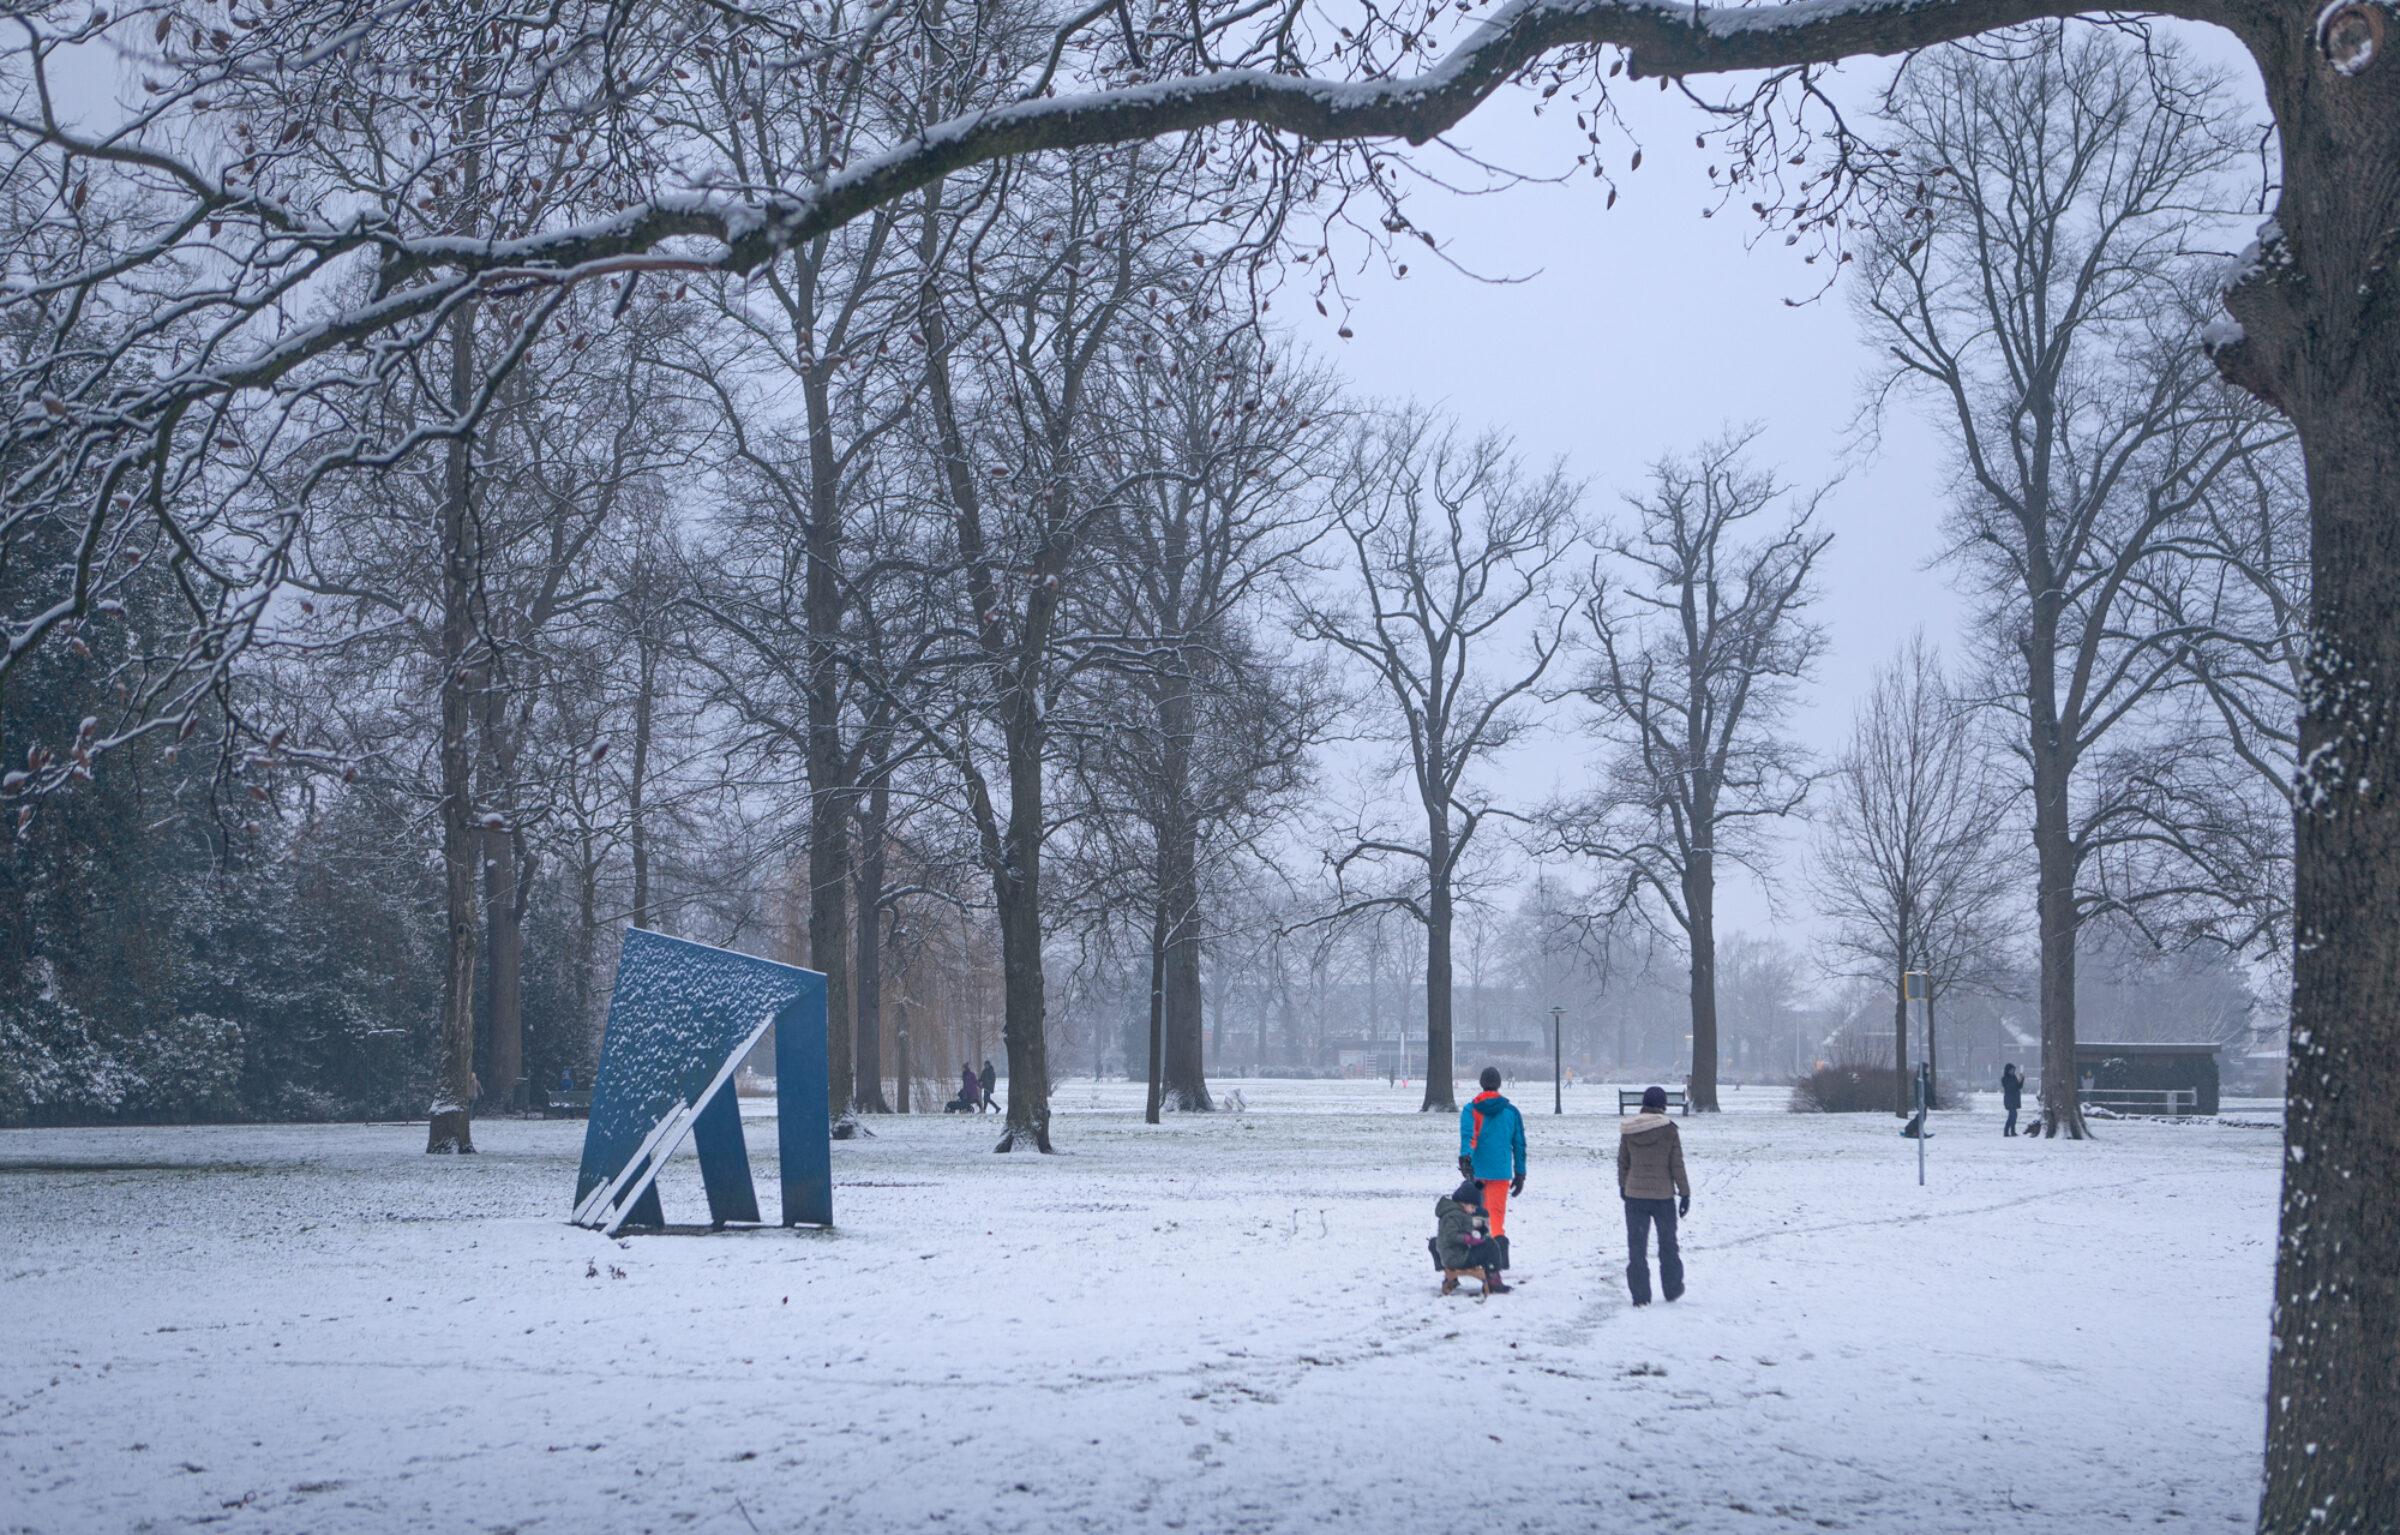 Sneeuwpret in Enschede